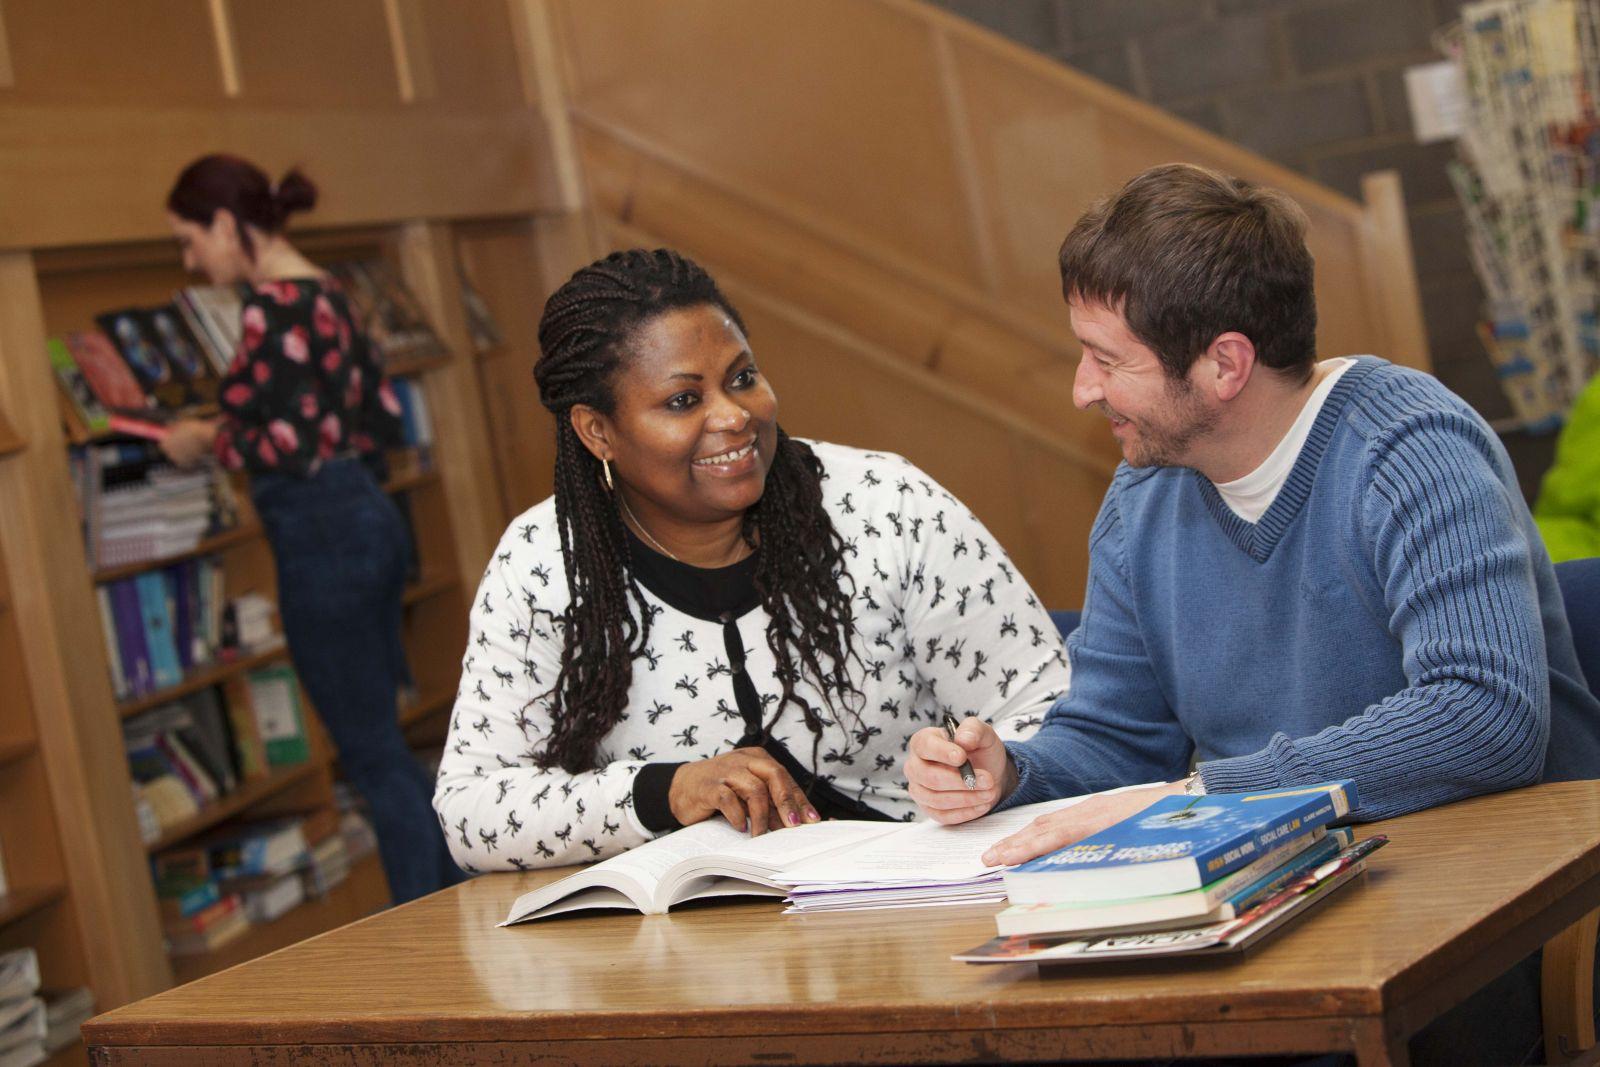 Degree mature student fee — 13